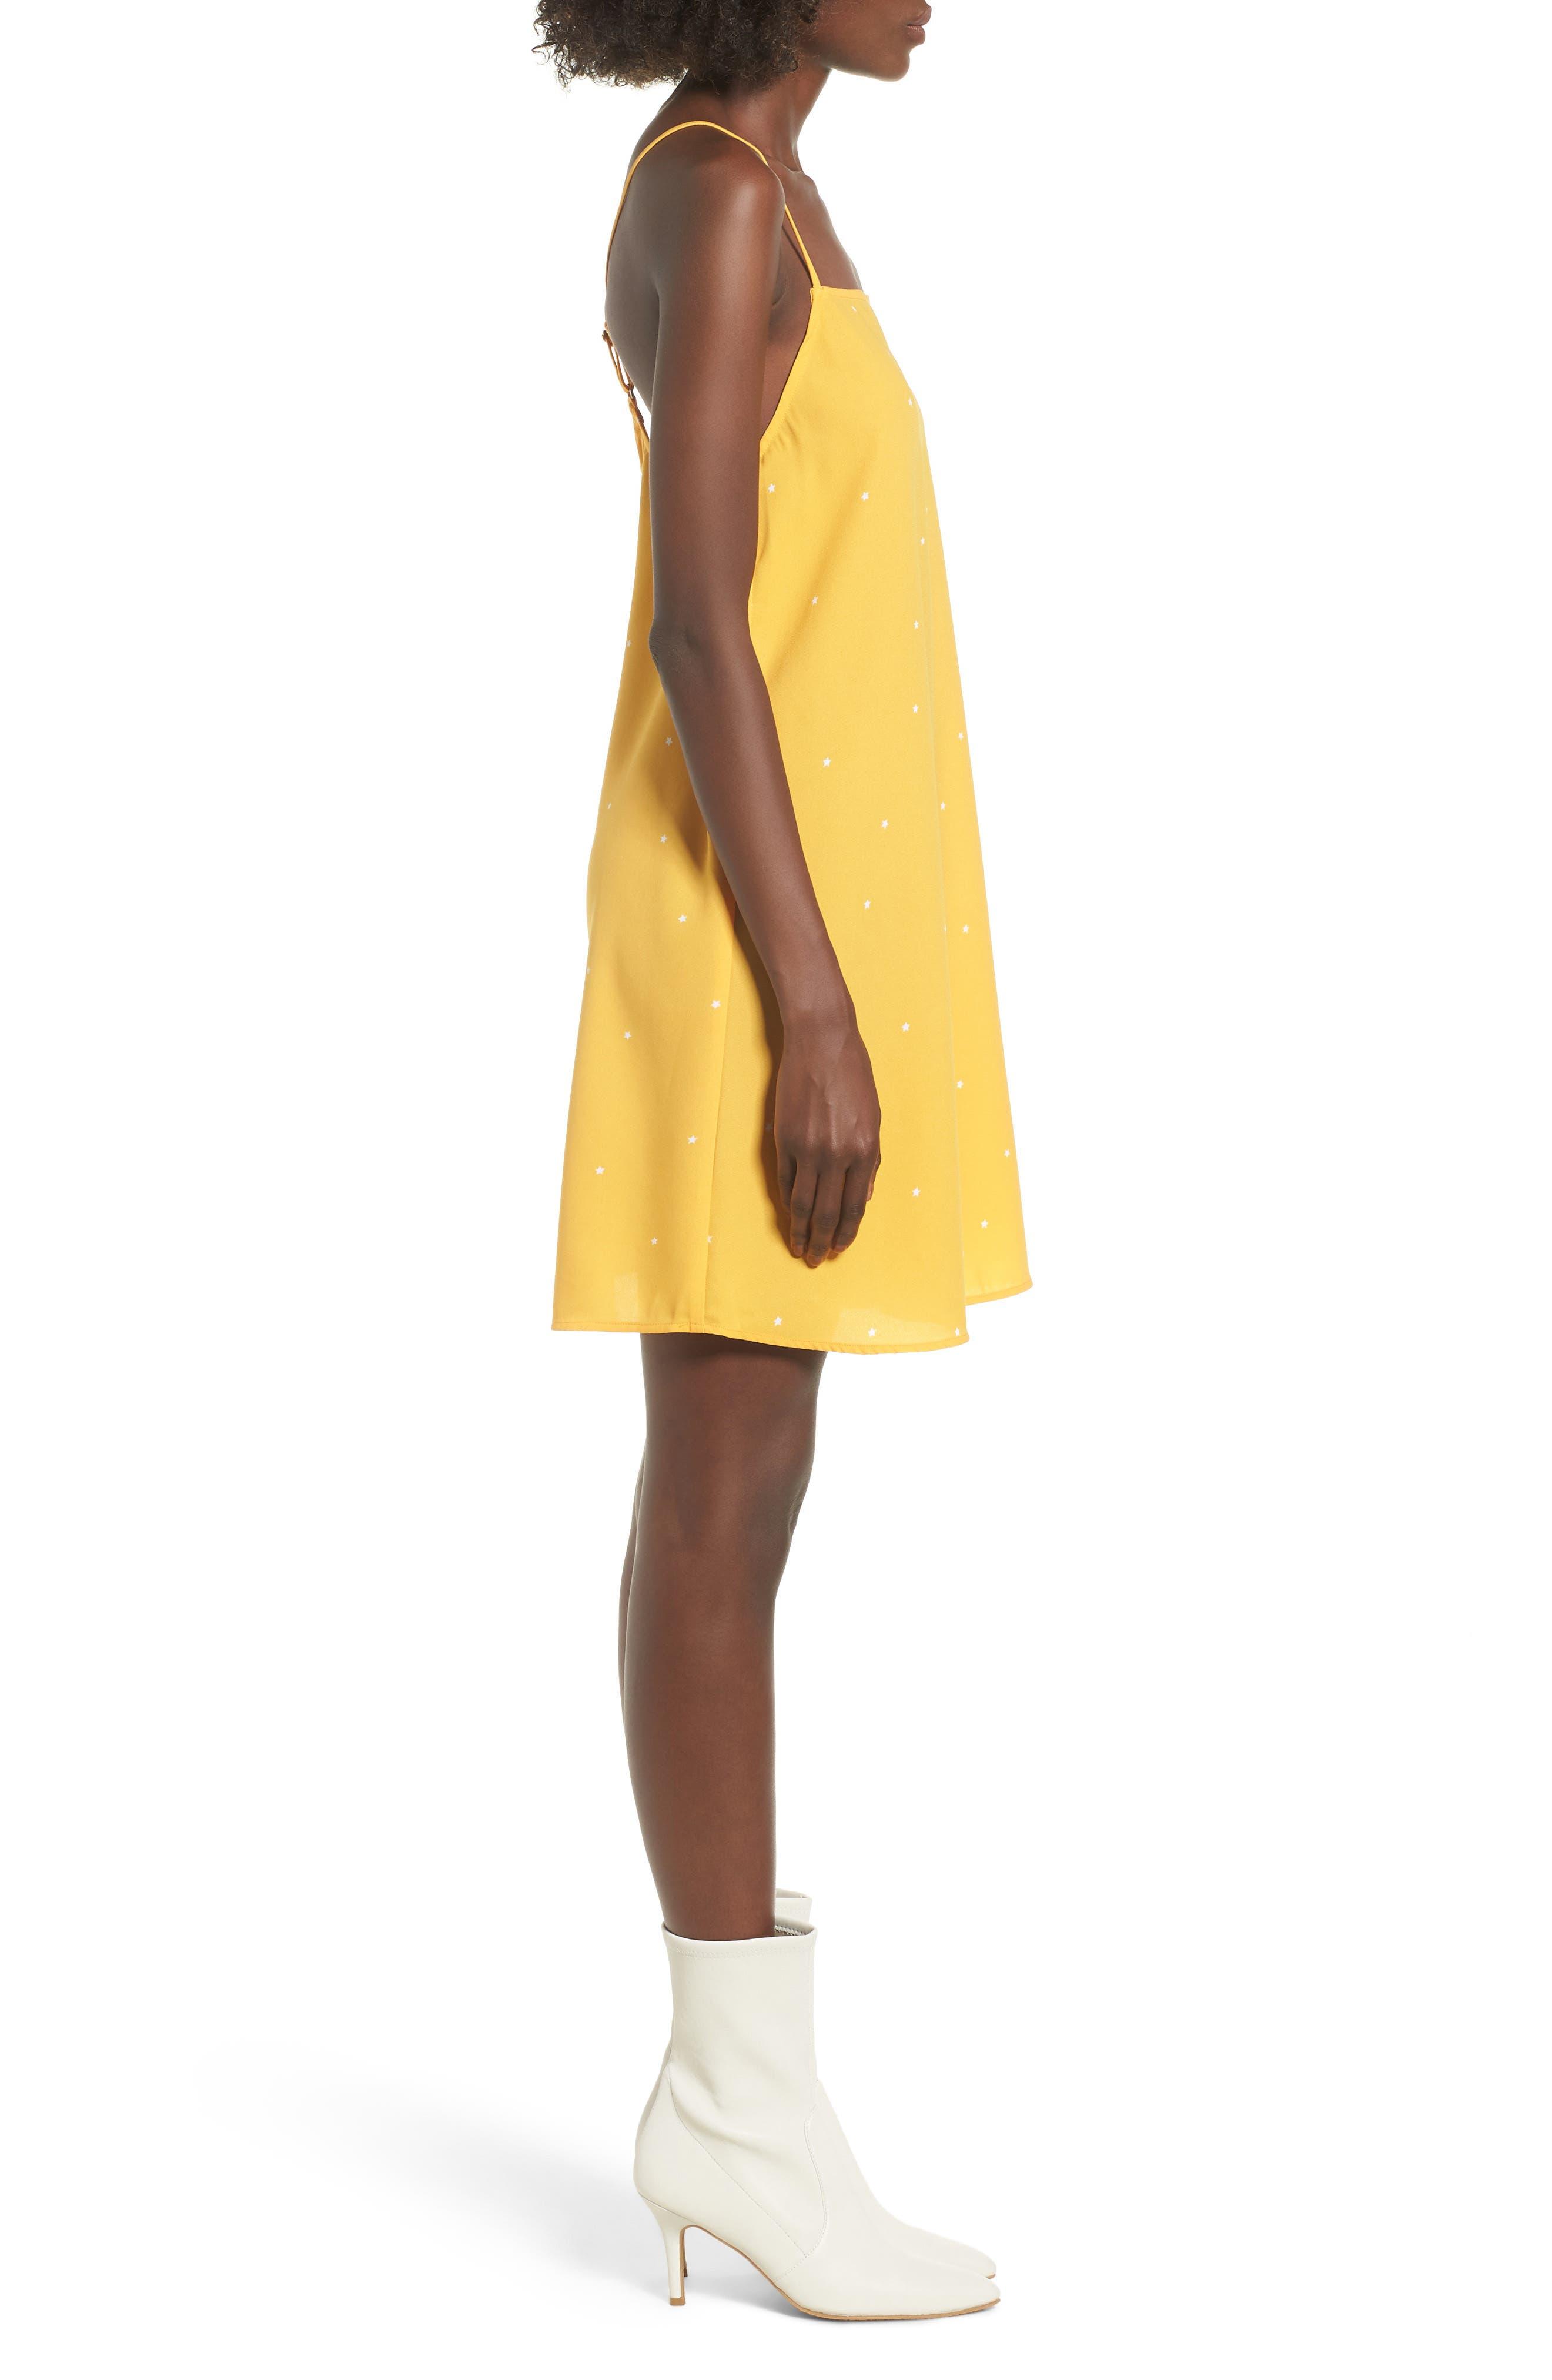 Mental 4 Metal Star Print Dress,                             Alternate thumbnail 3, color,                             Citrus Gold